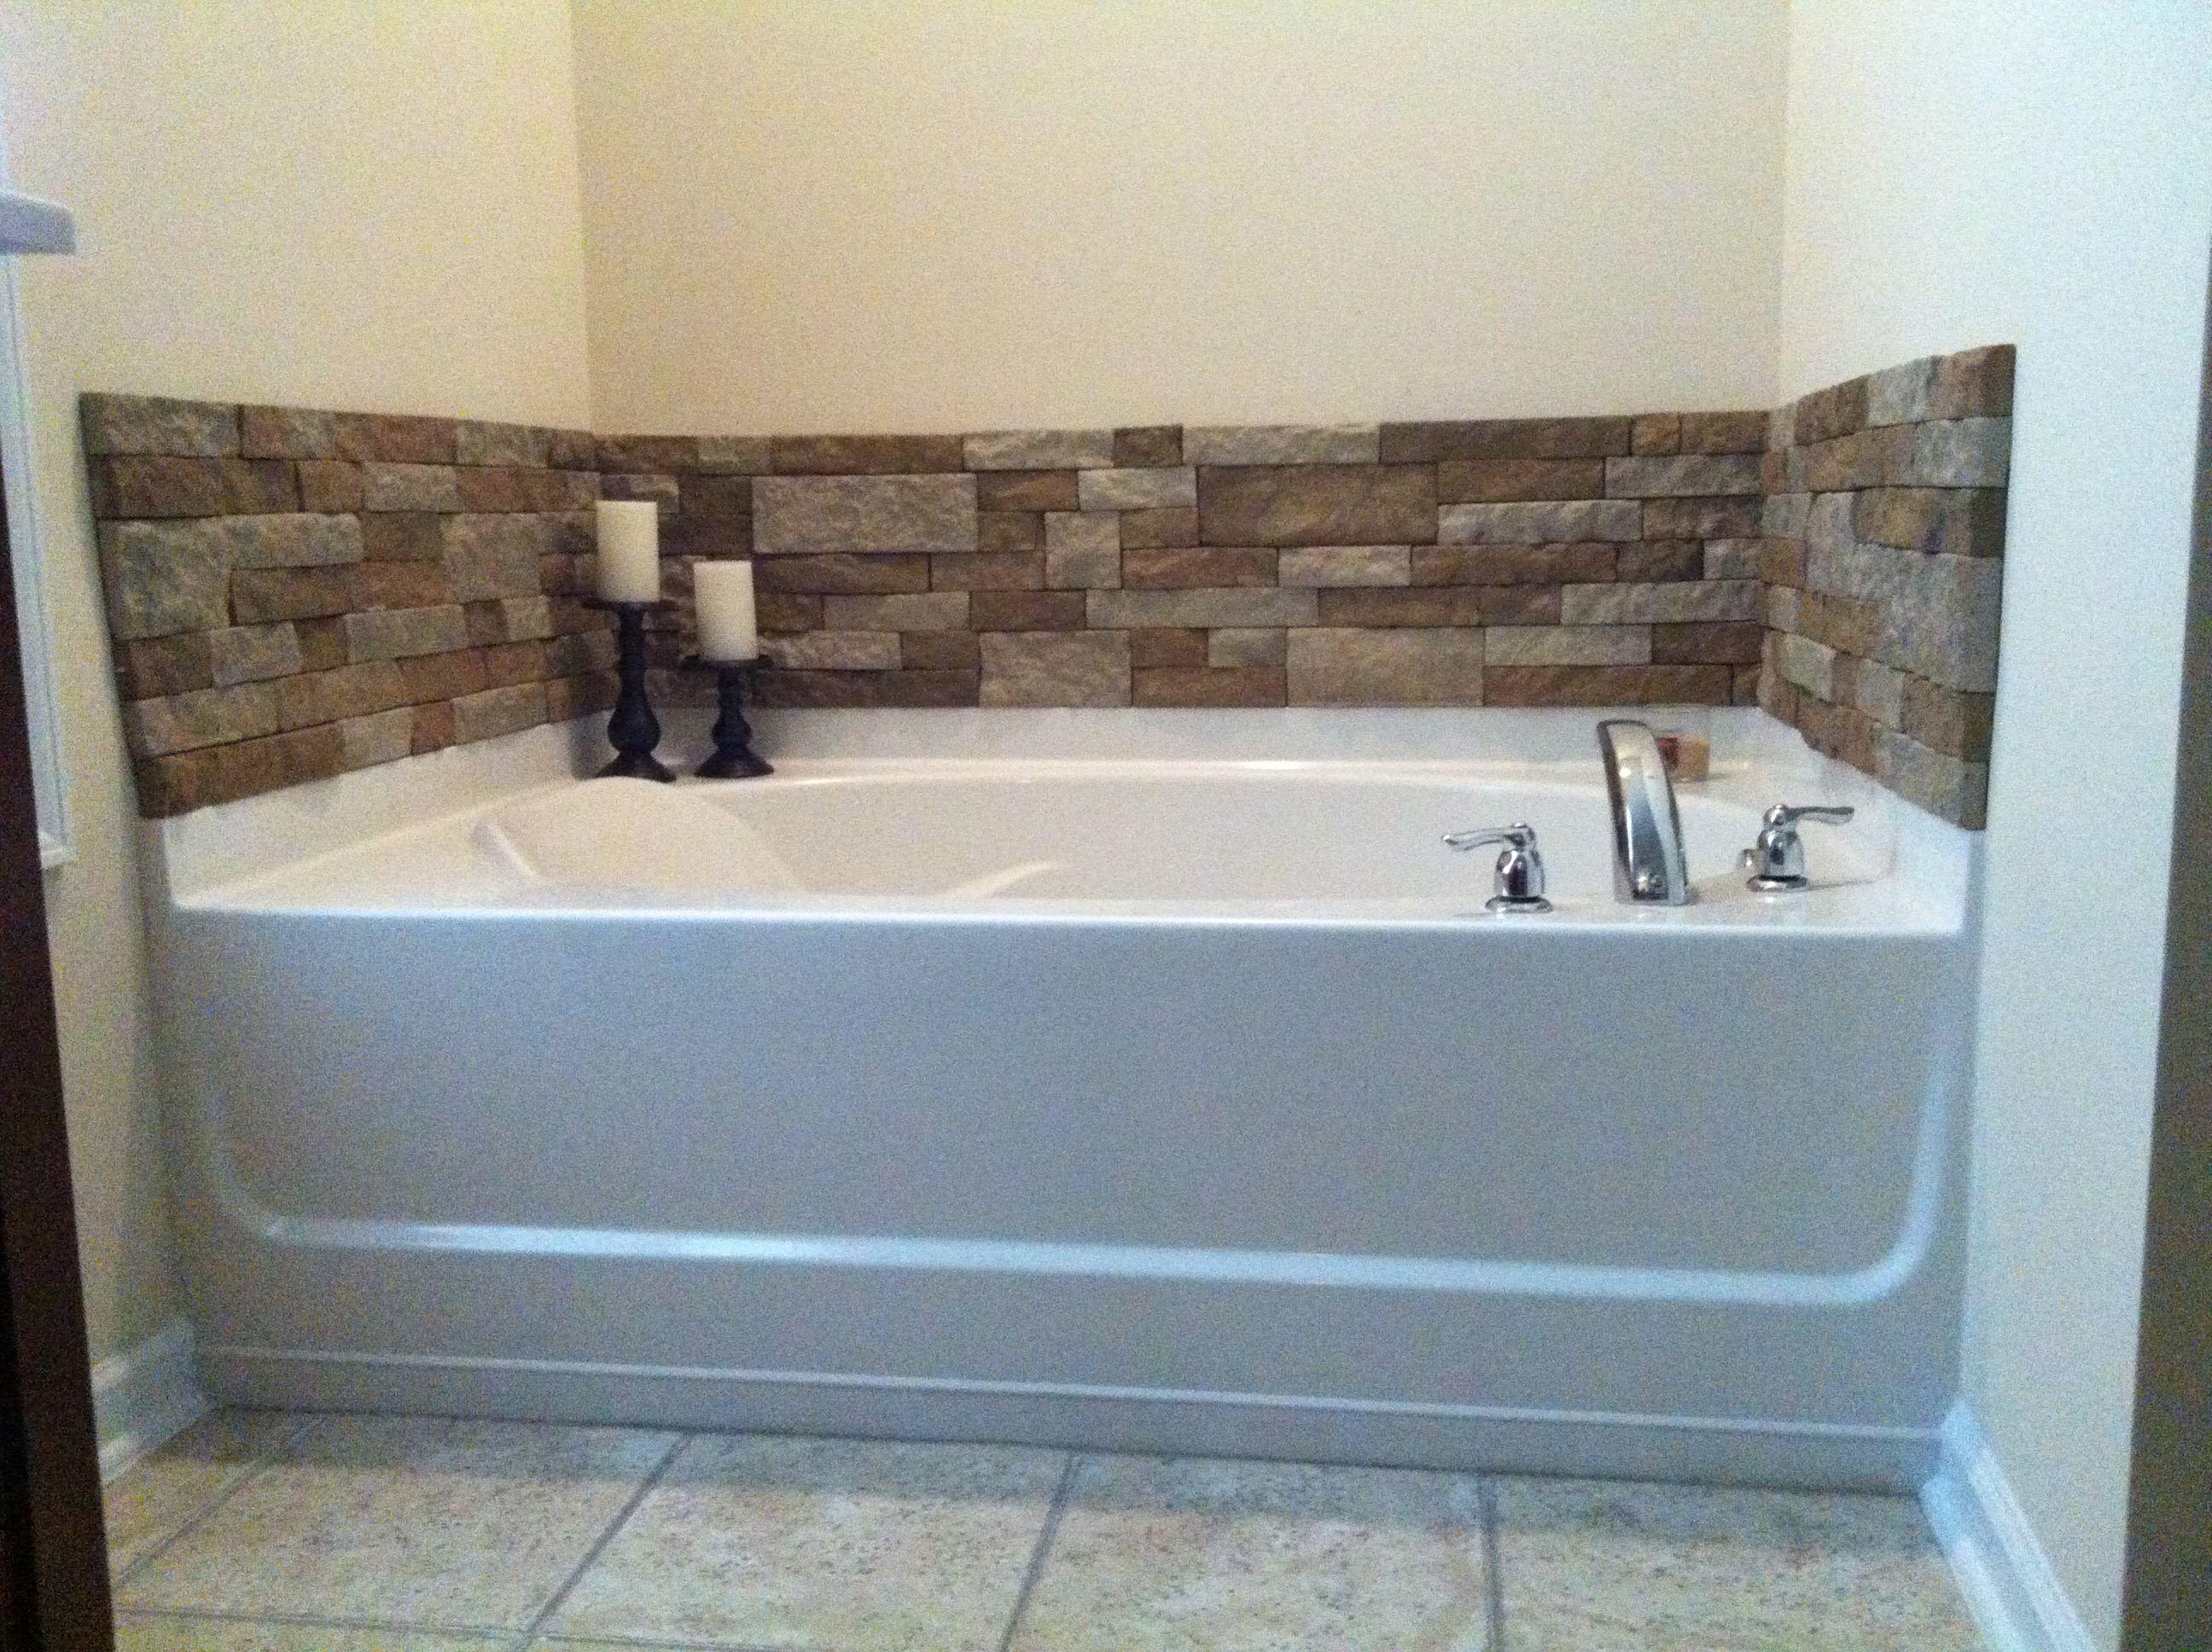 Top Airstone Accent Wall Bathroom - 5dec6e57d8482952577cf58851c7024a  Trends_109638.jpg